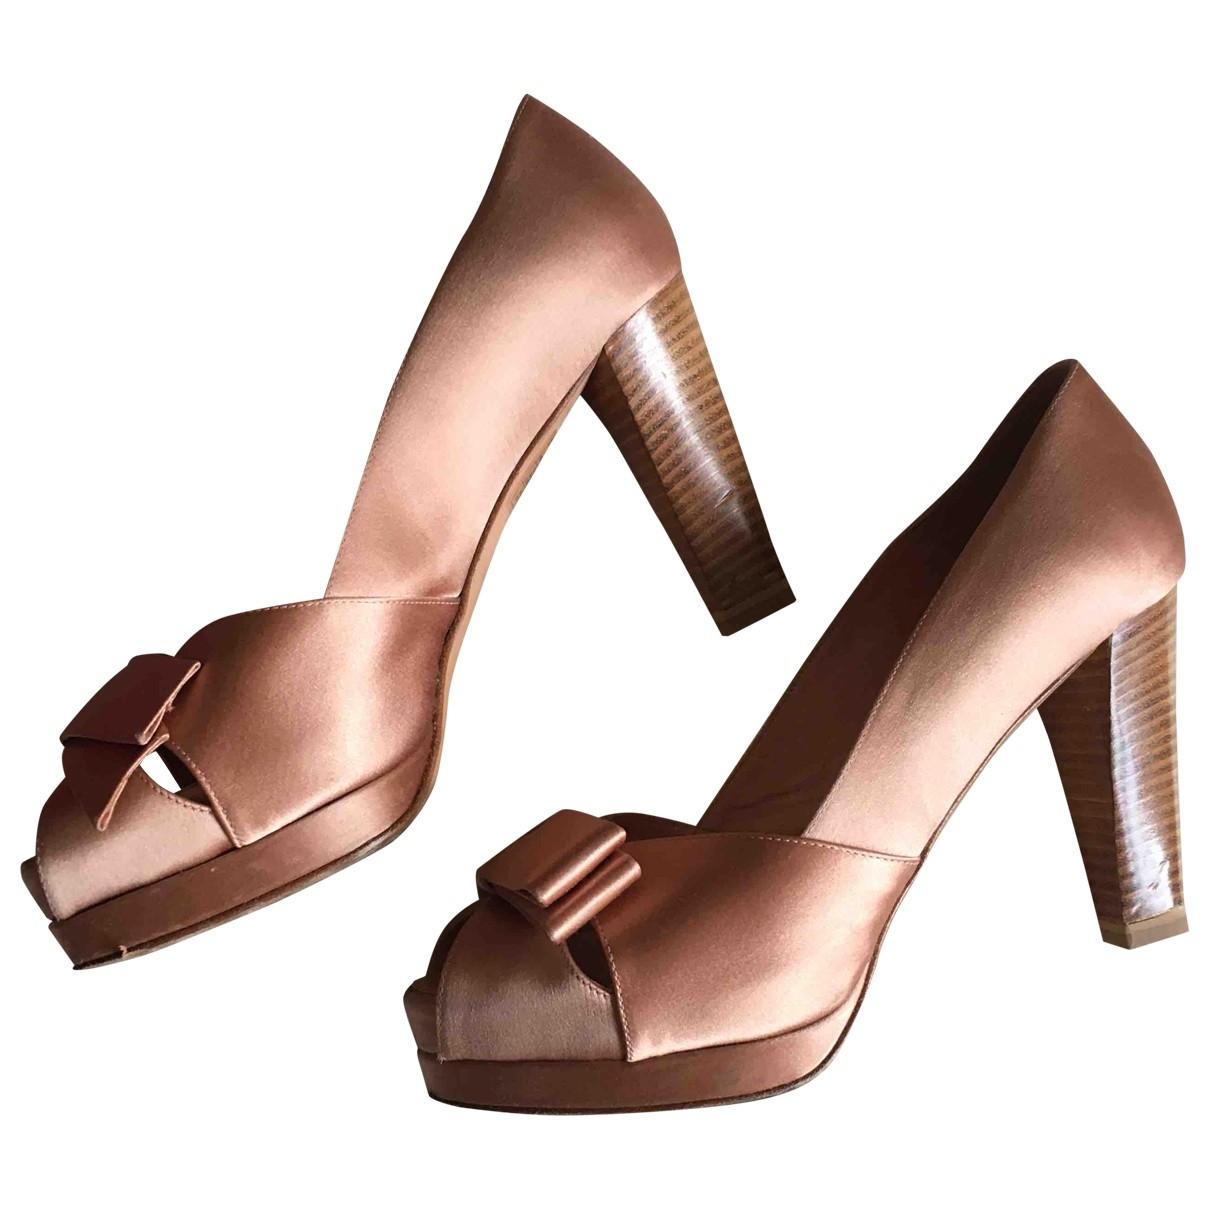 Lella Baldi \N Pink Leather Heels for Women 37 EU